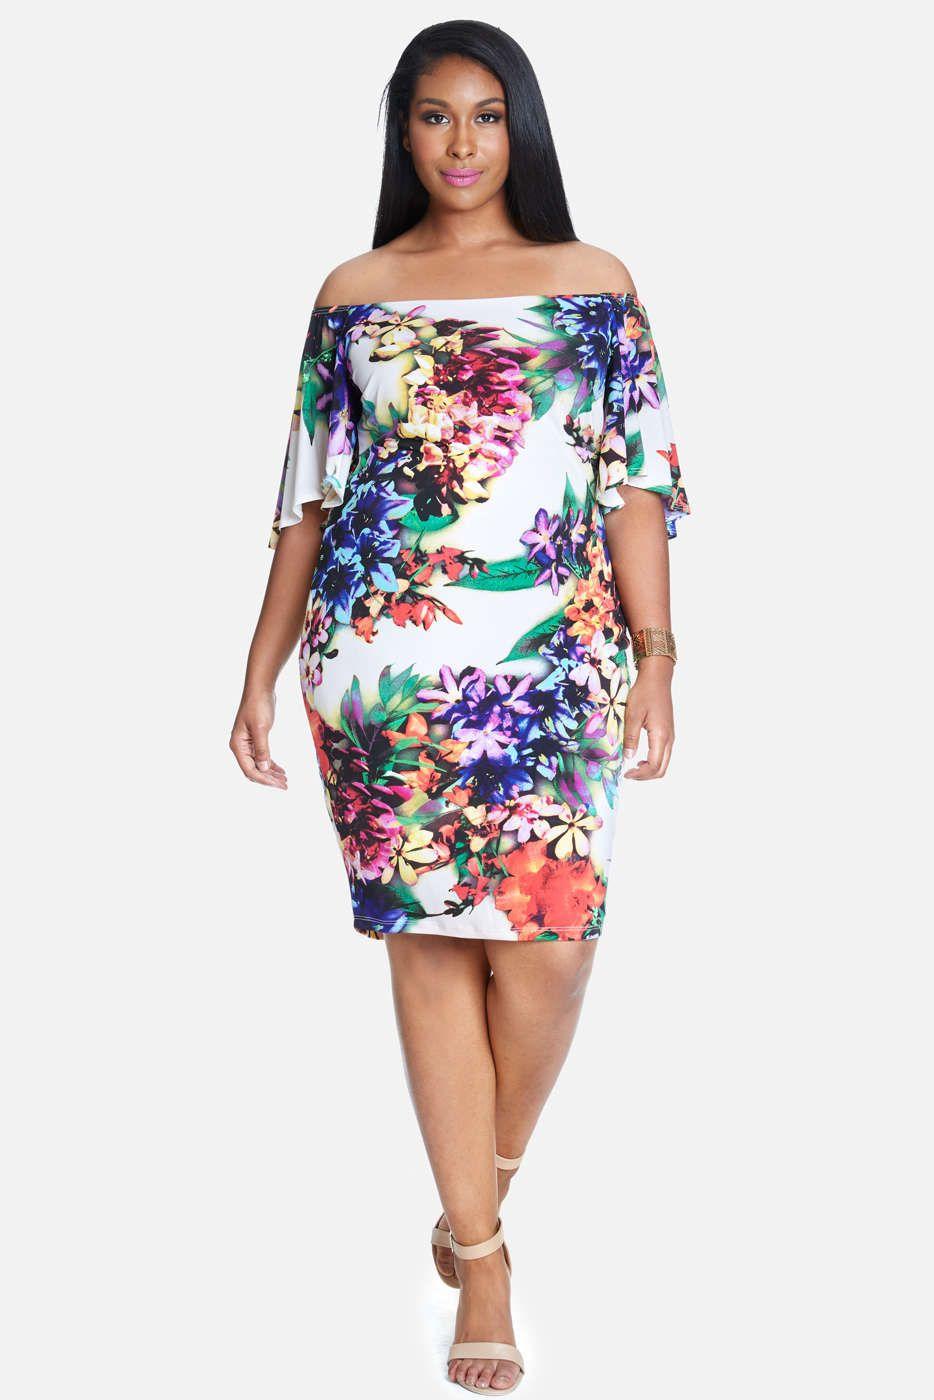 Plus size dresses fashion to figure